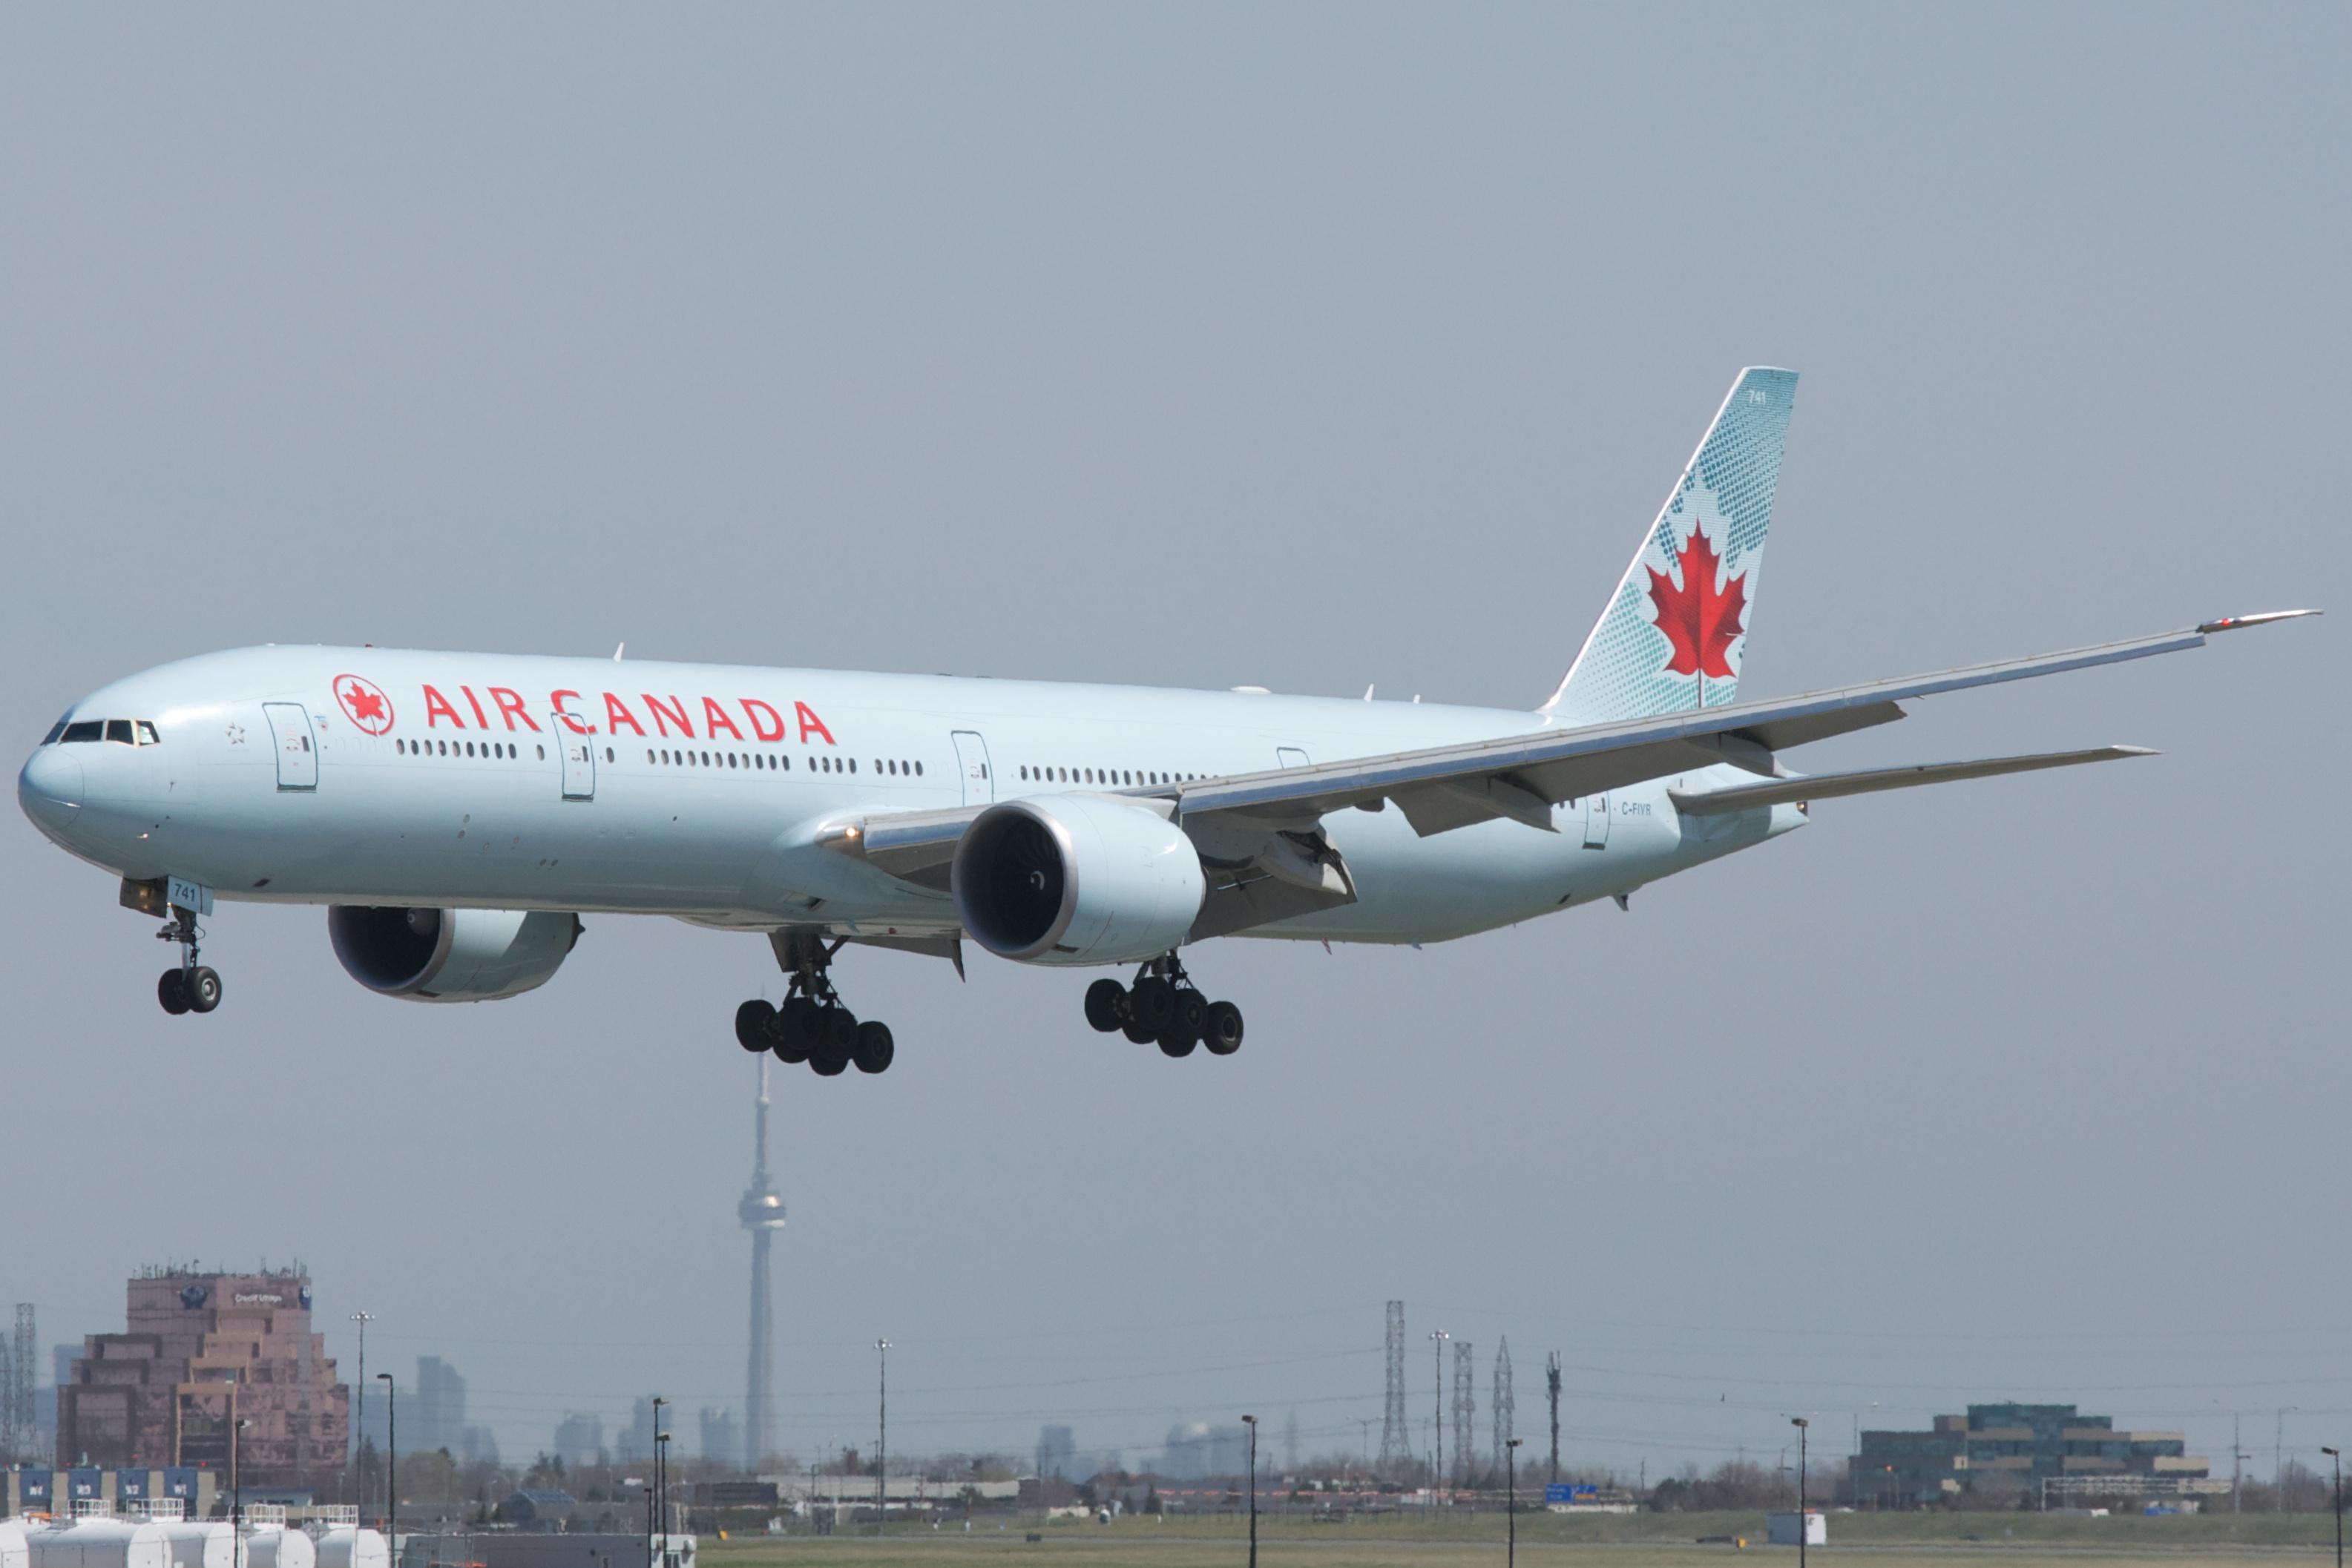 Air Canada Short Haul Flights From Kitchener